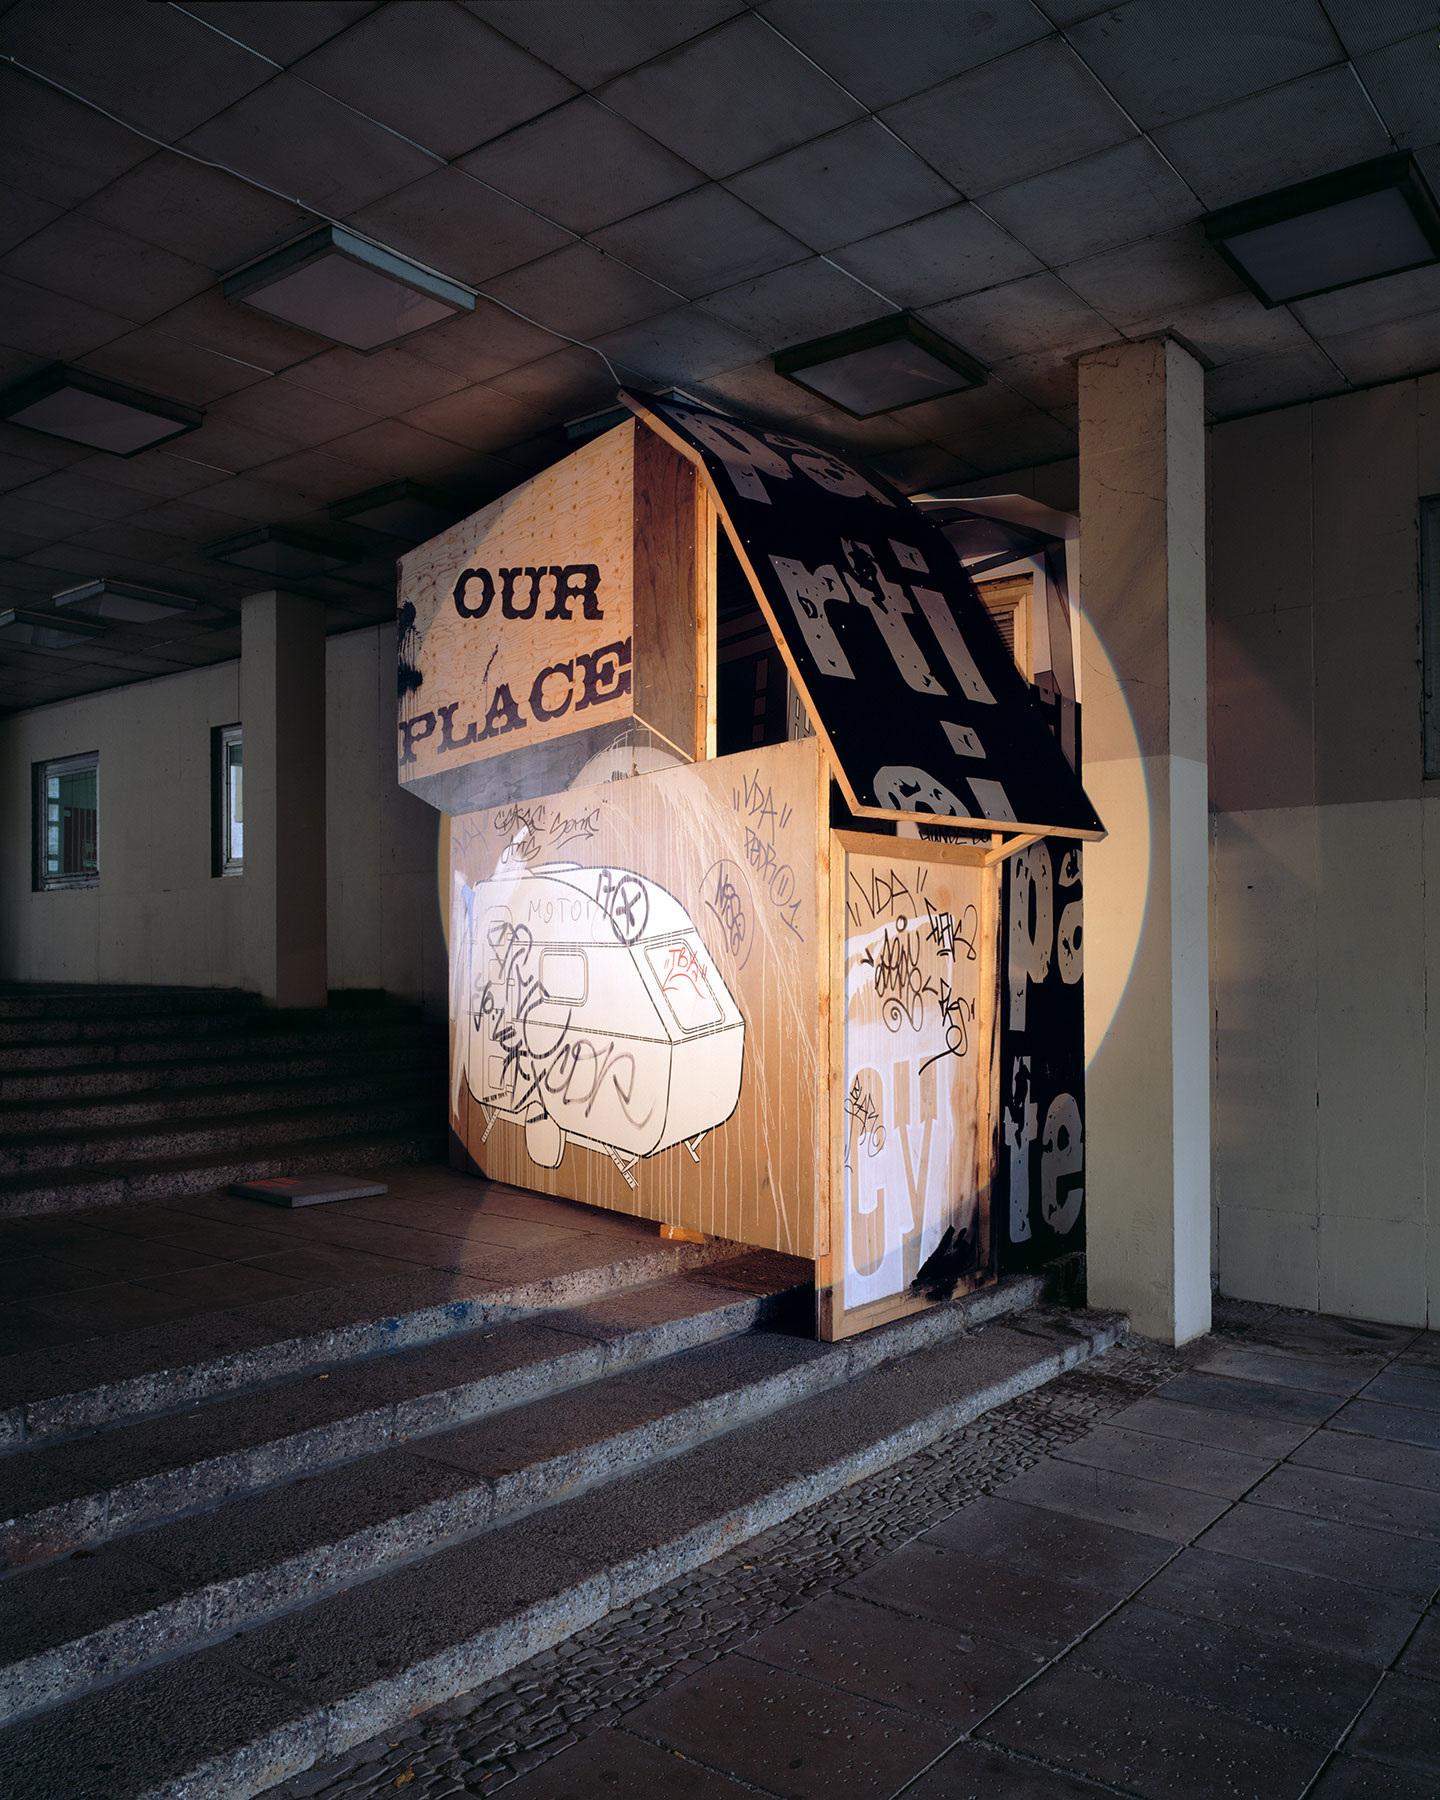 Brahm_Daniela_Recycling-Utopia_2006_15